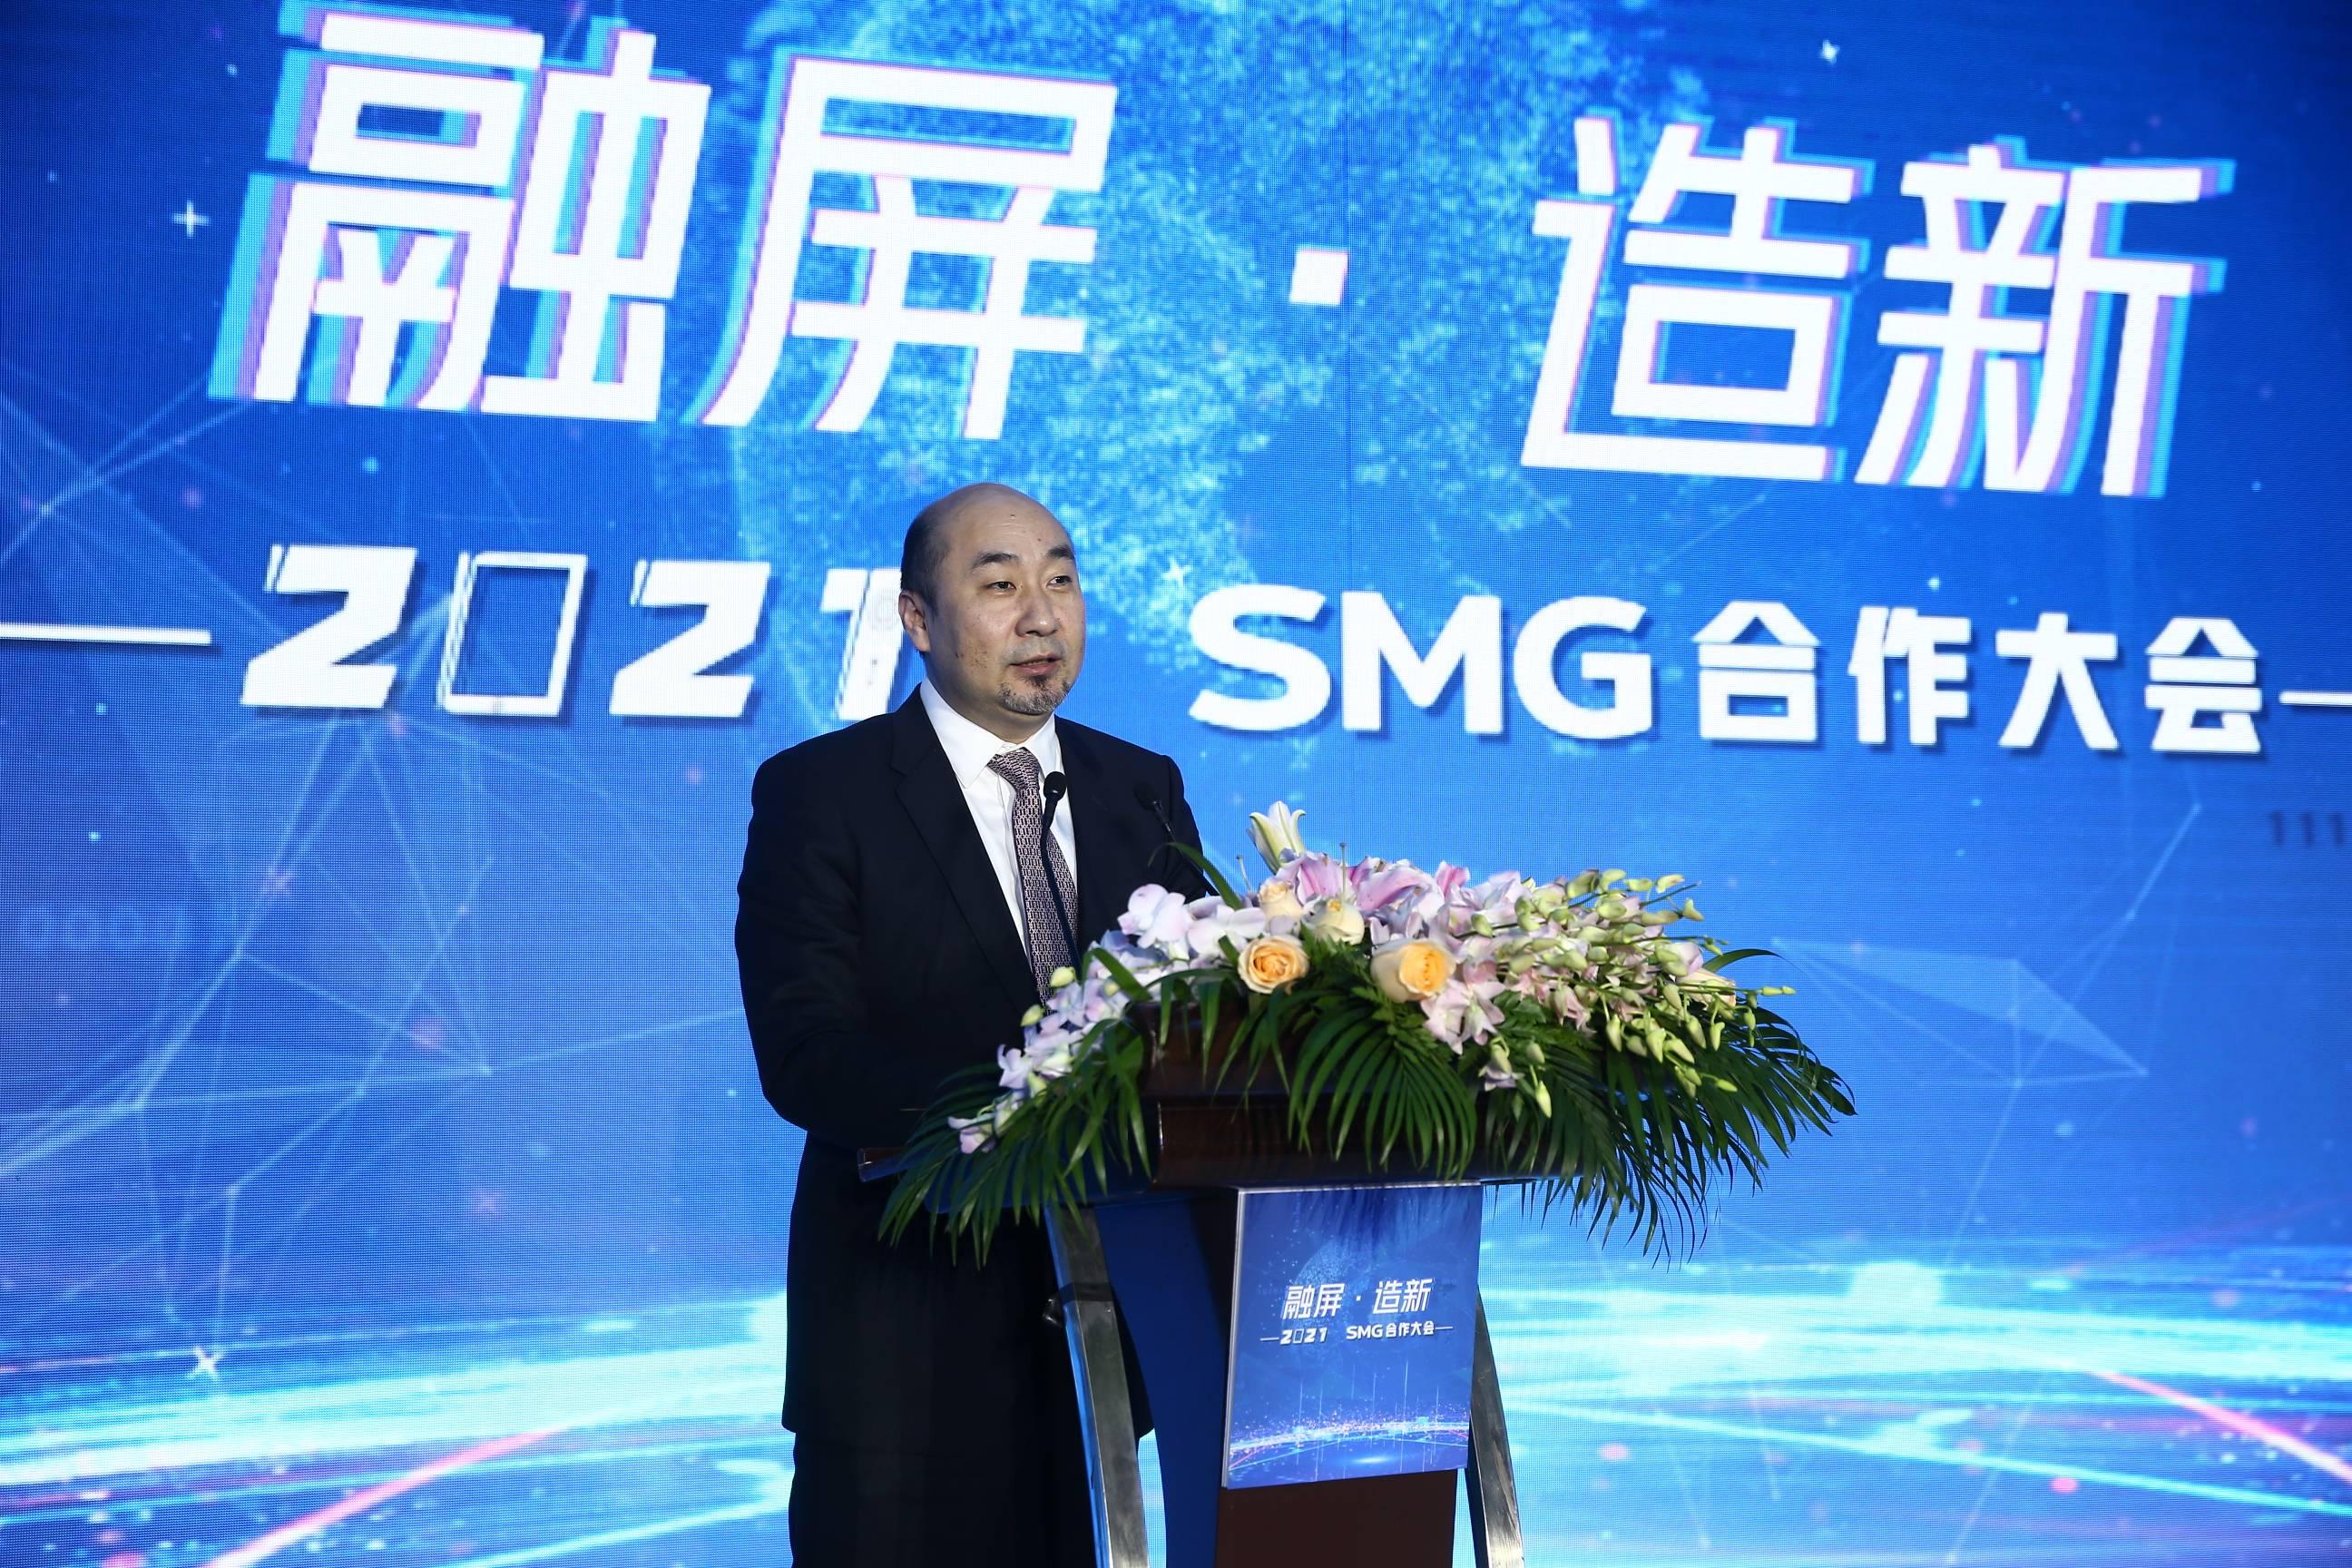 2021SMG合作大会,激活电视大屏流量池